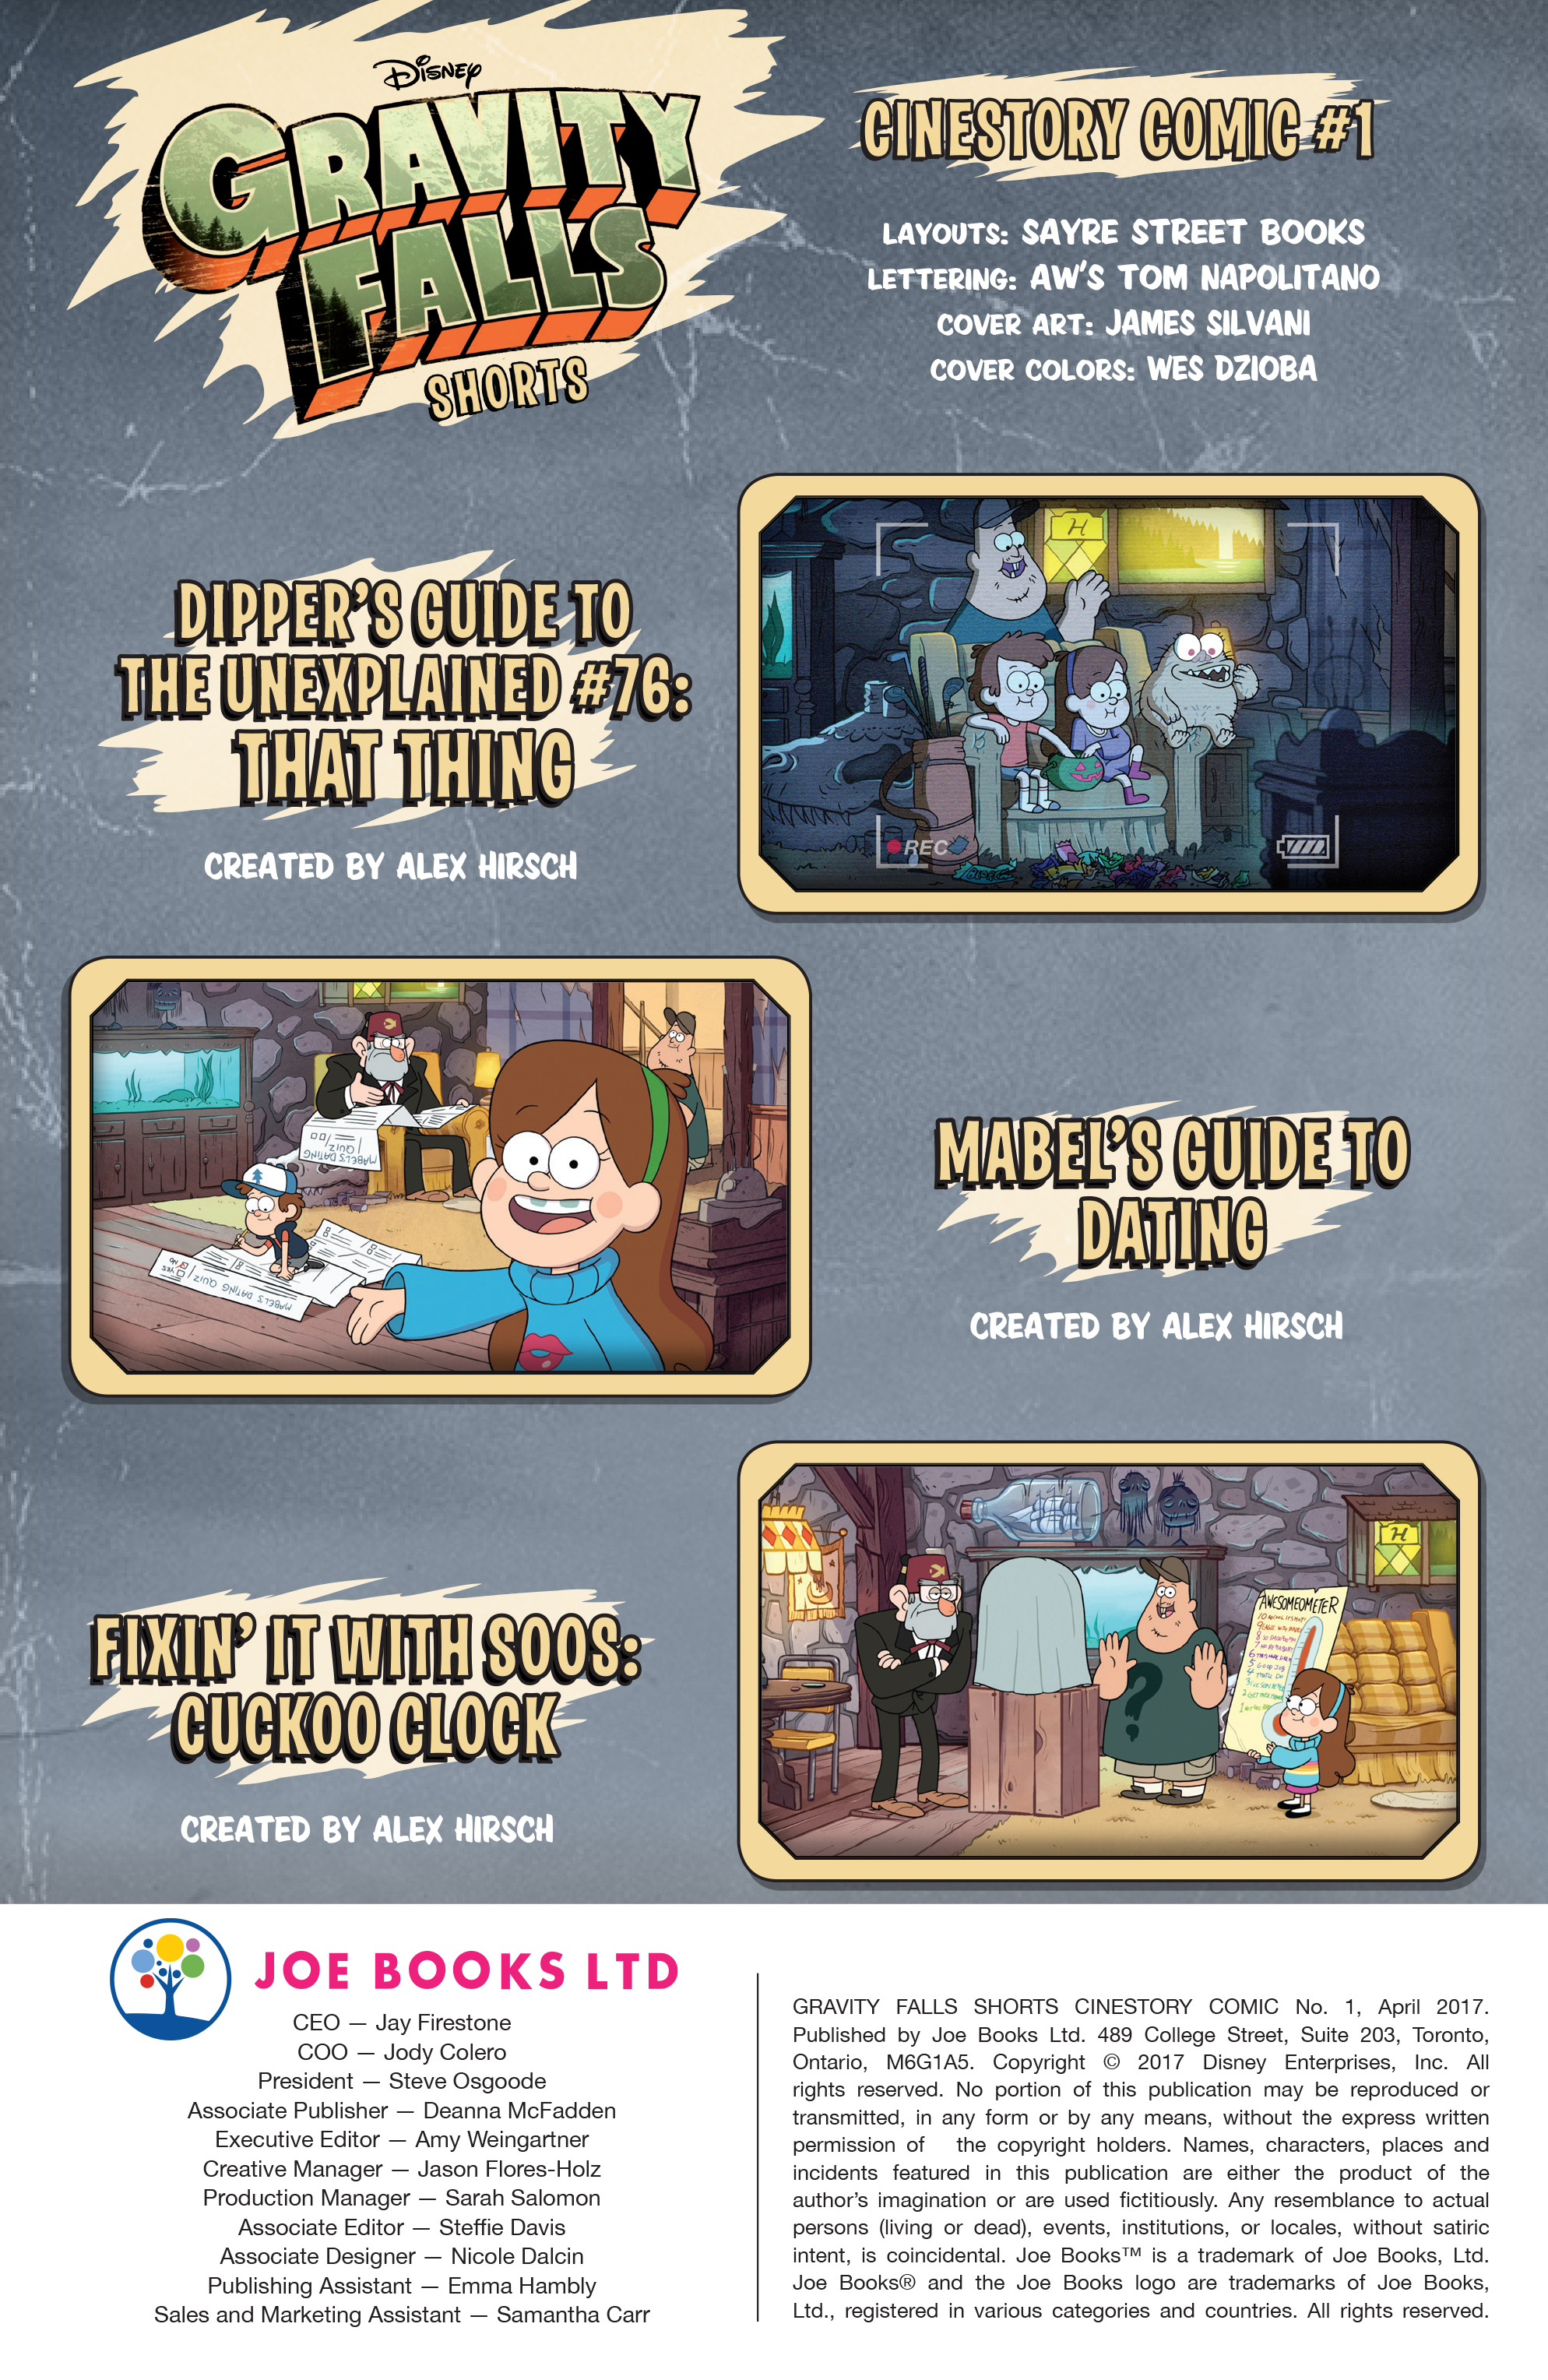 Read online Disney Gravity Falls Shorts Cinestory Comic comic -  Issue #1 - 2